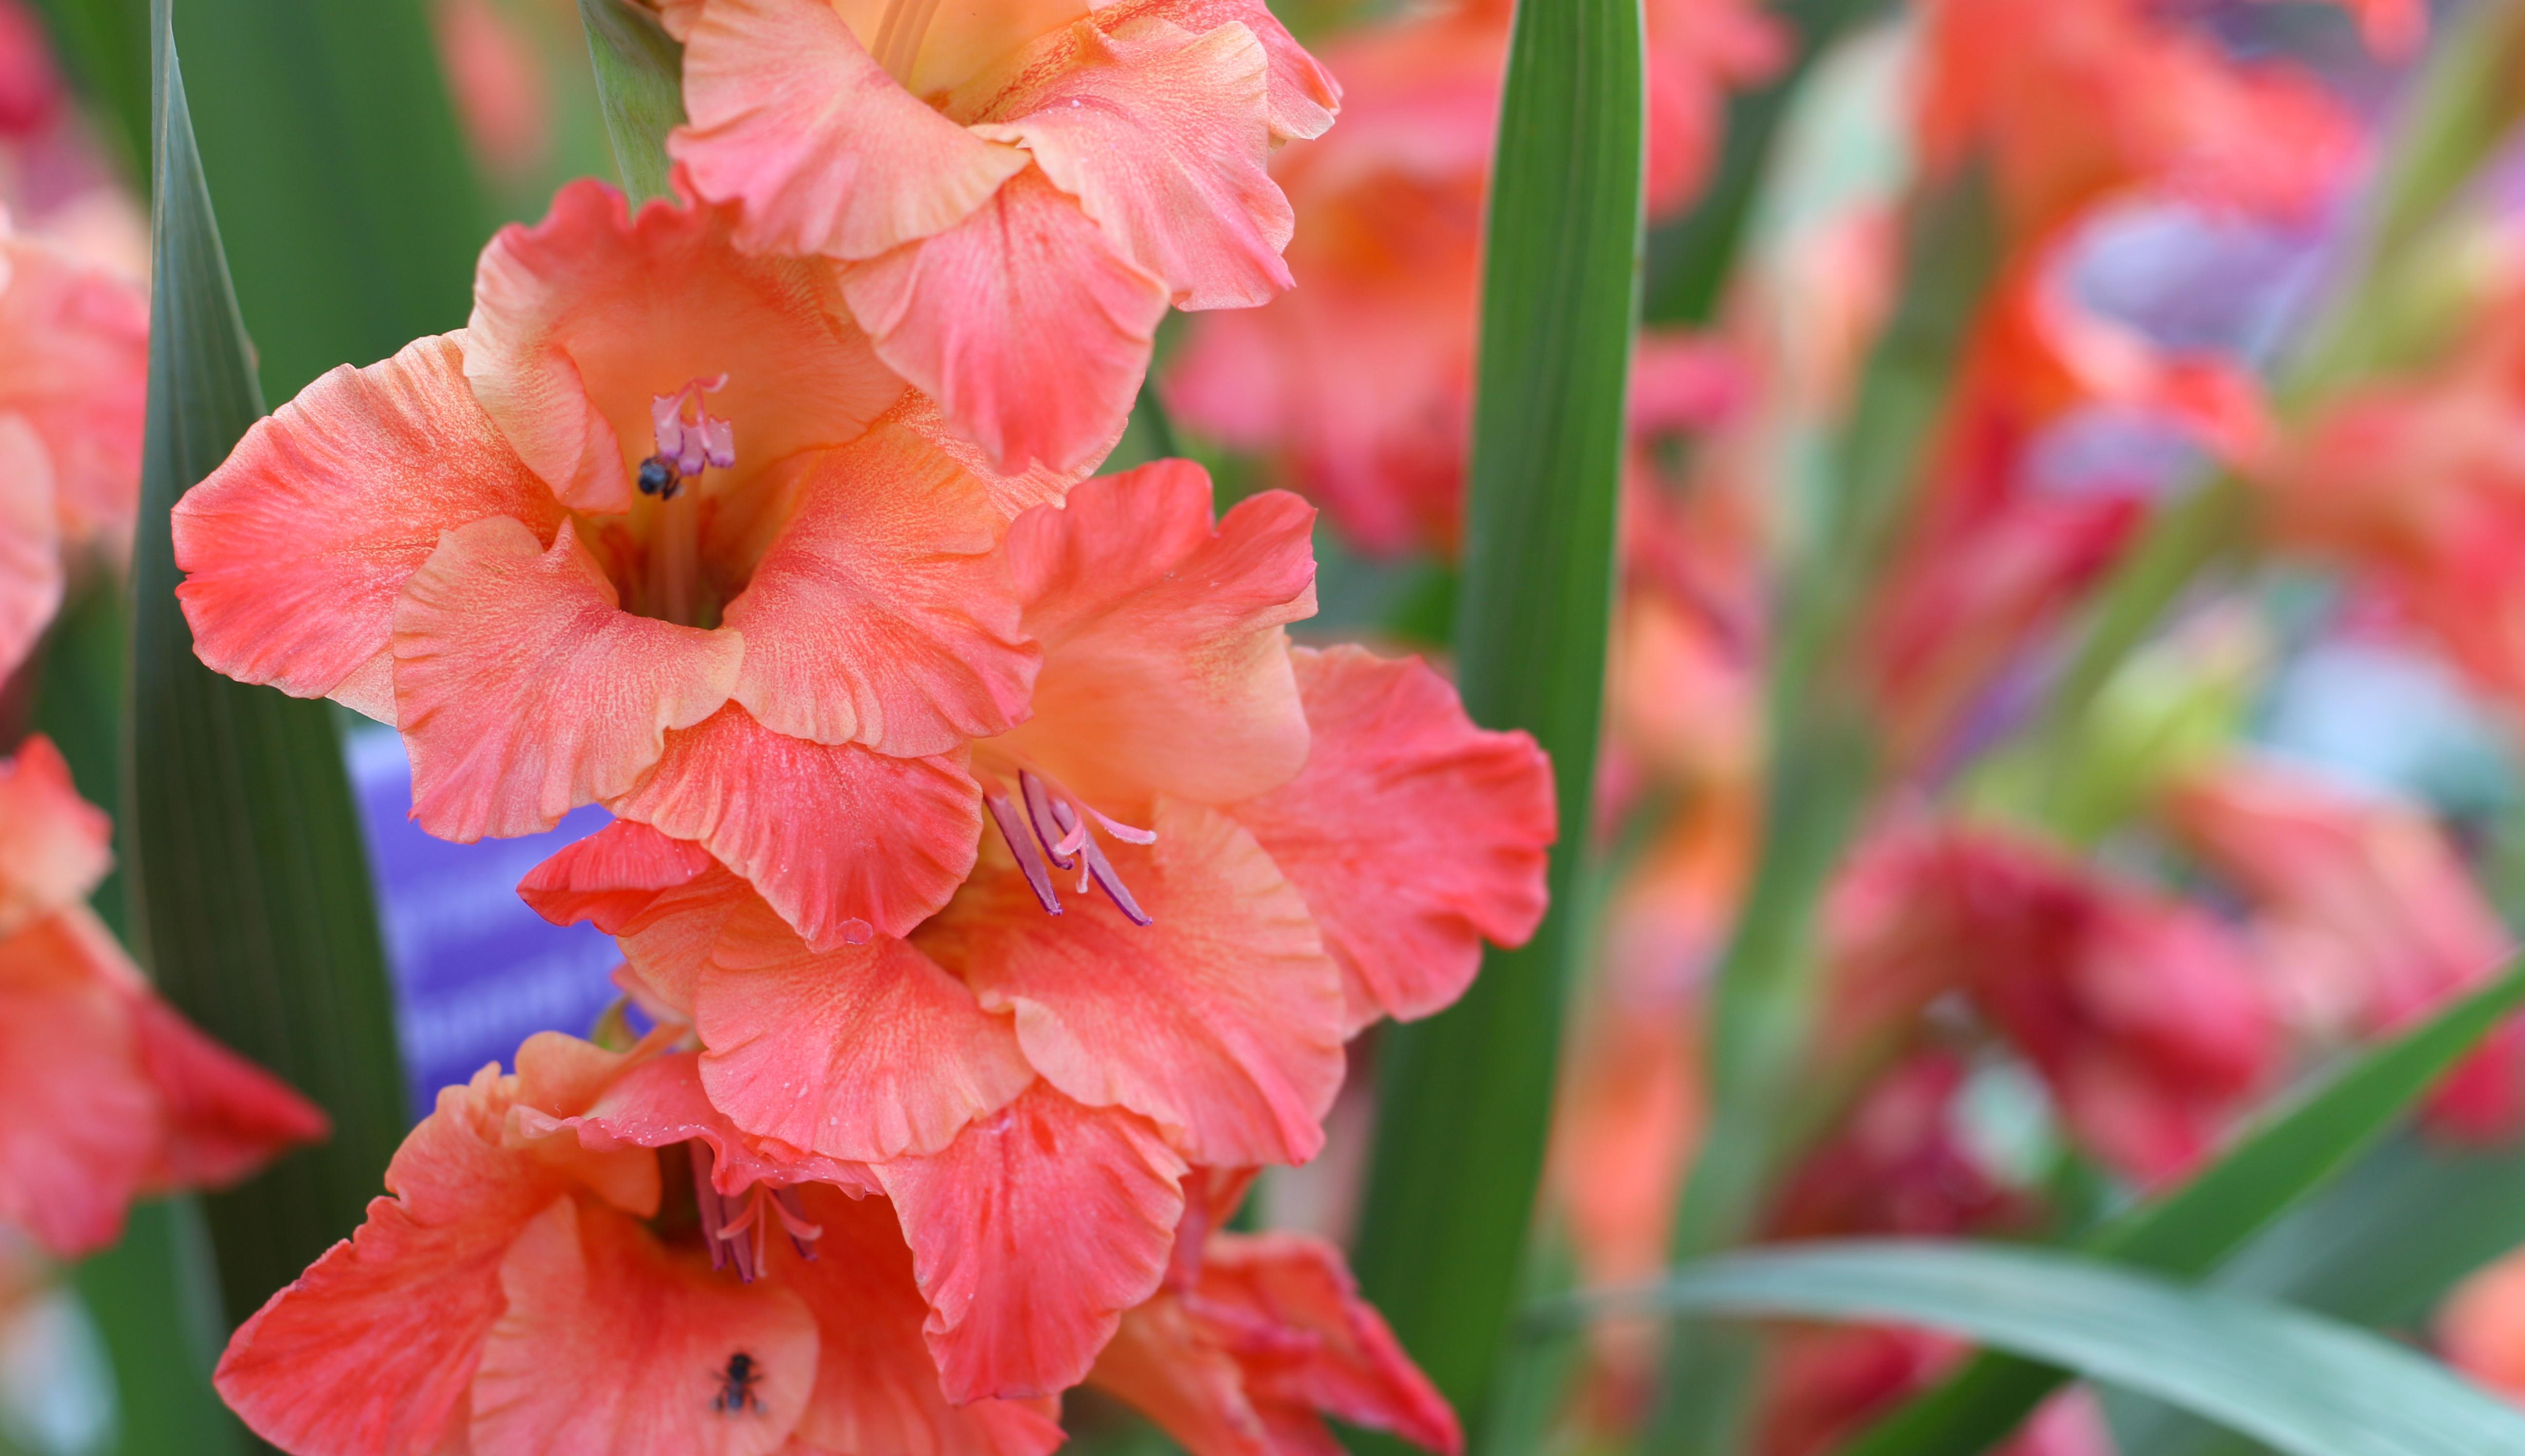 Close up image of peach gladiolus flowers.